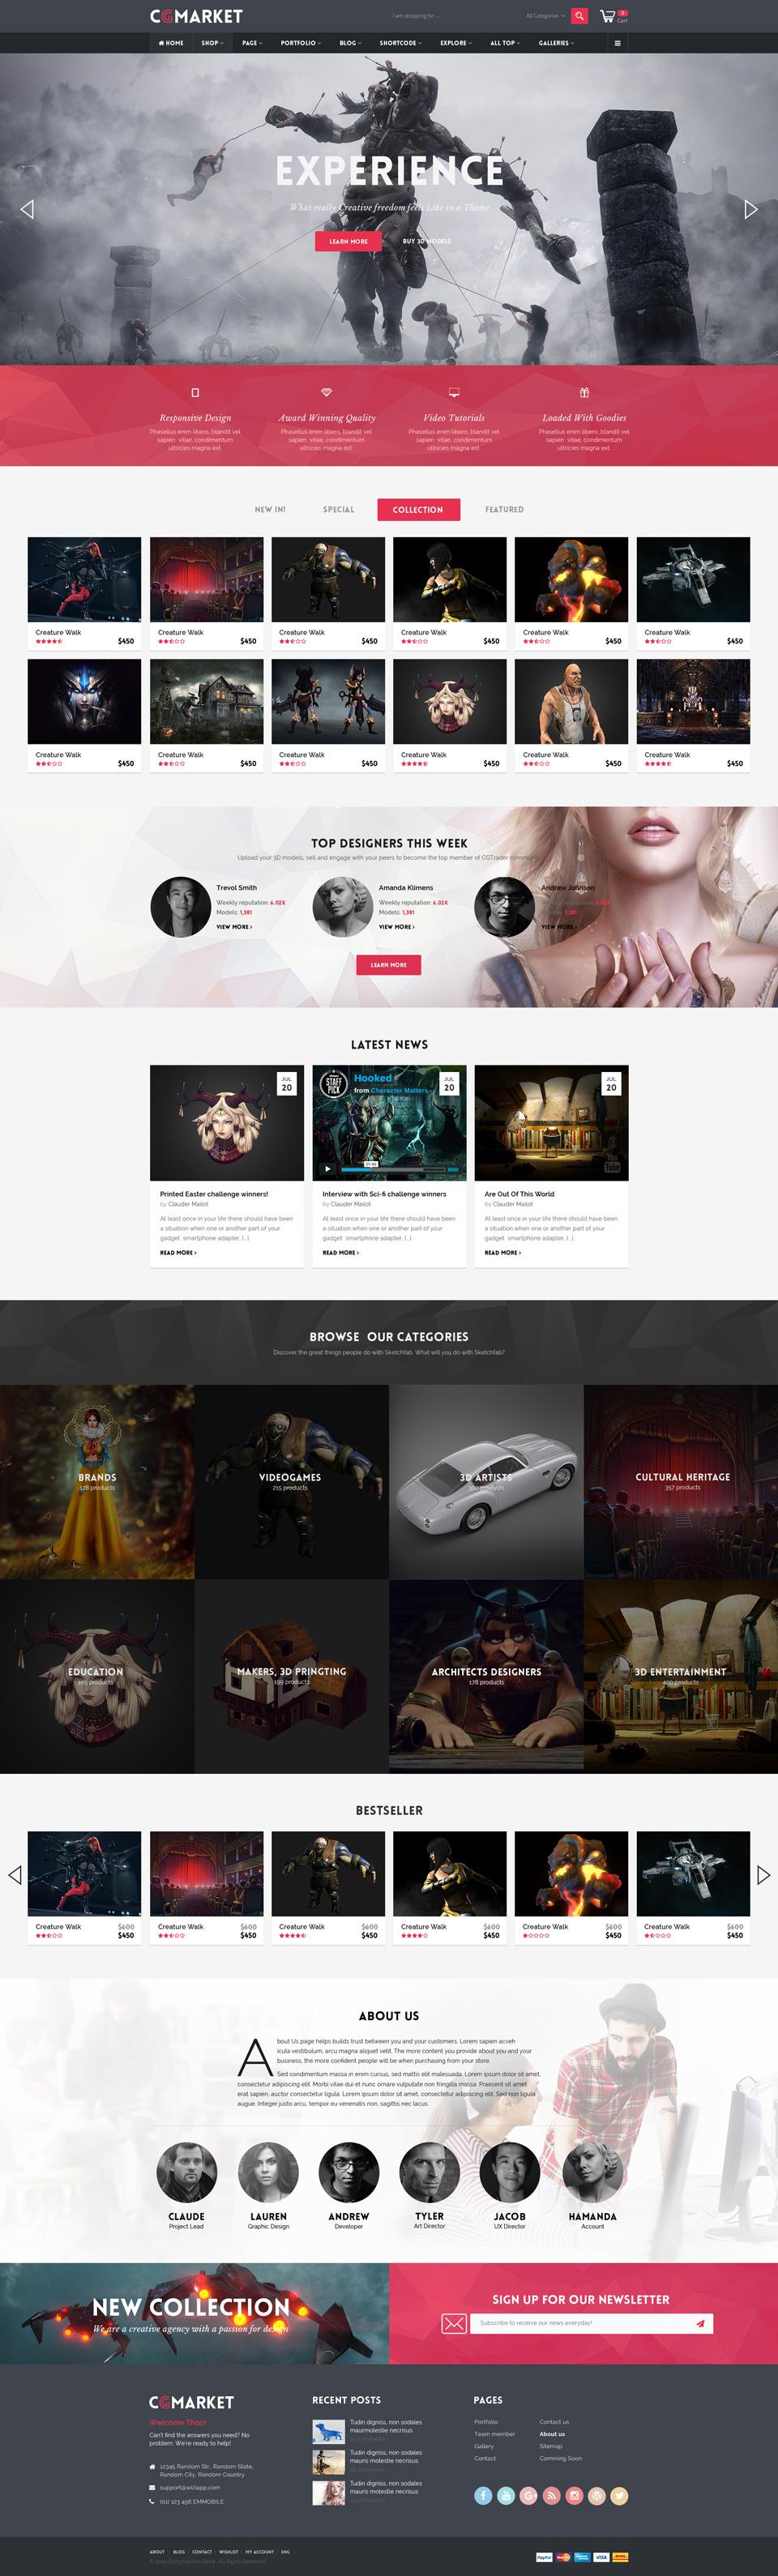 Dance CGMarket - 3D Model Marketplace Design PSD Template by tvlgiao